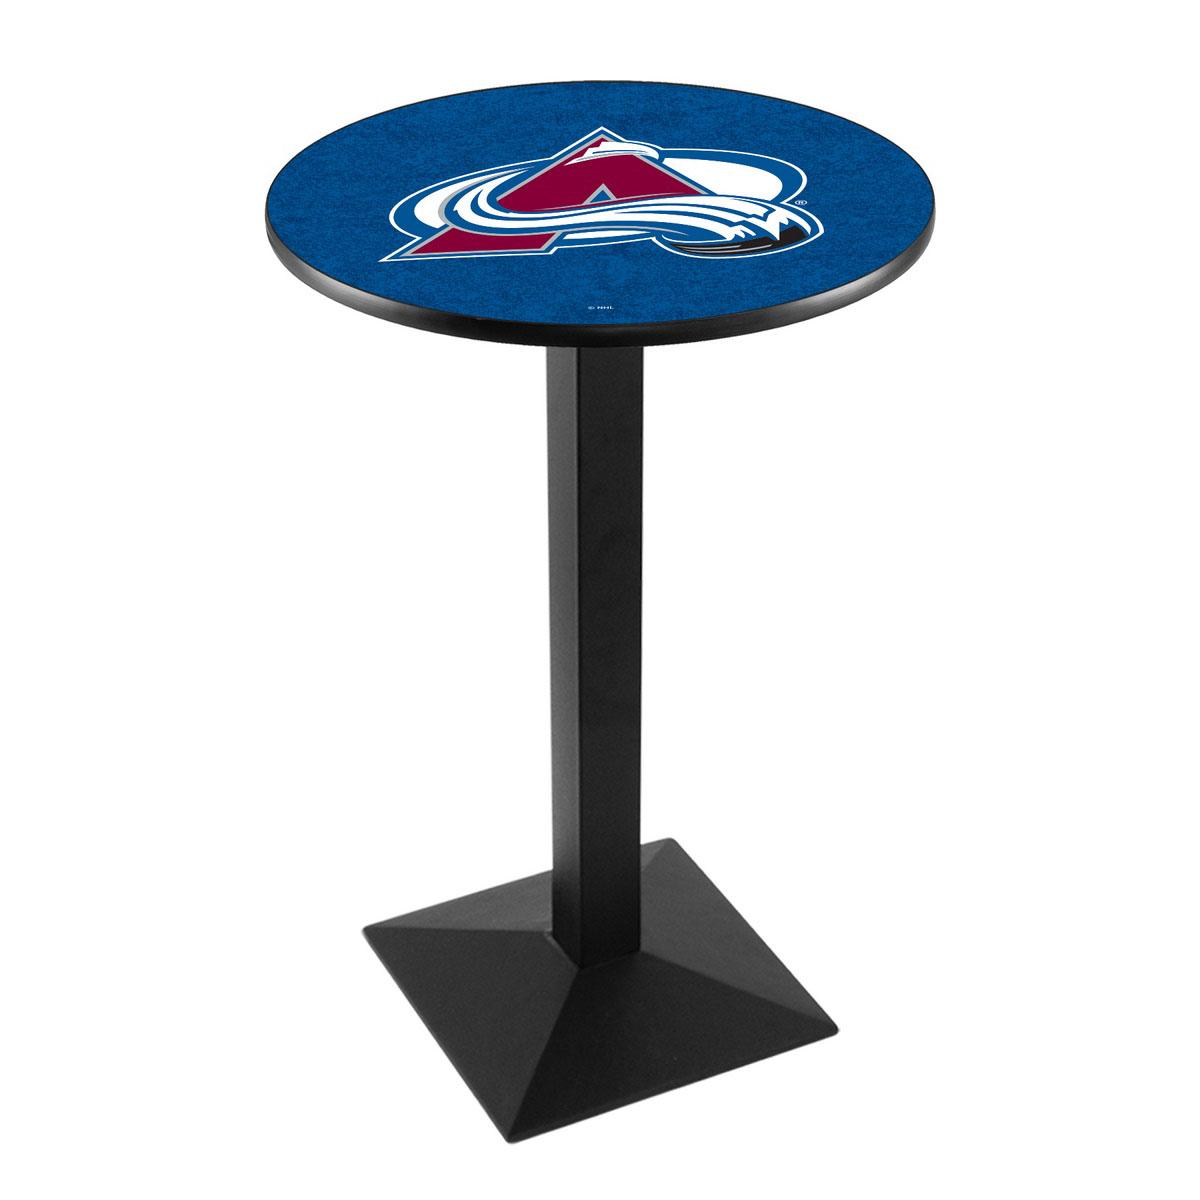 Order Colorado Avalanche Logo Pub Bar Table Square Stand Product Photo